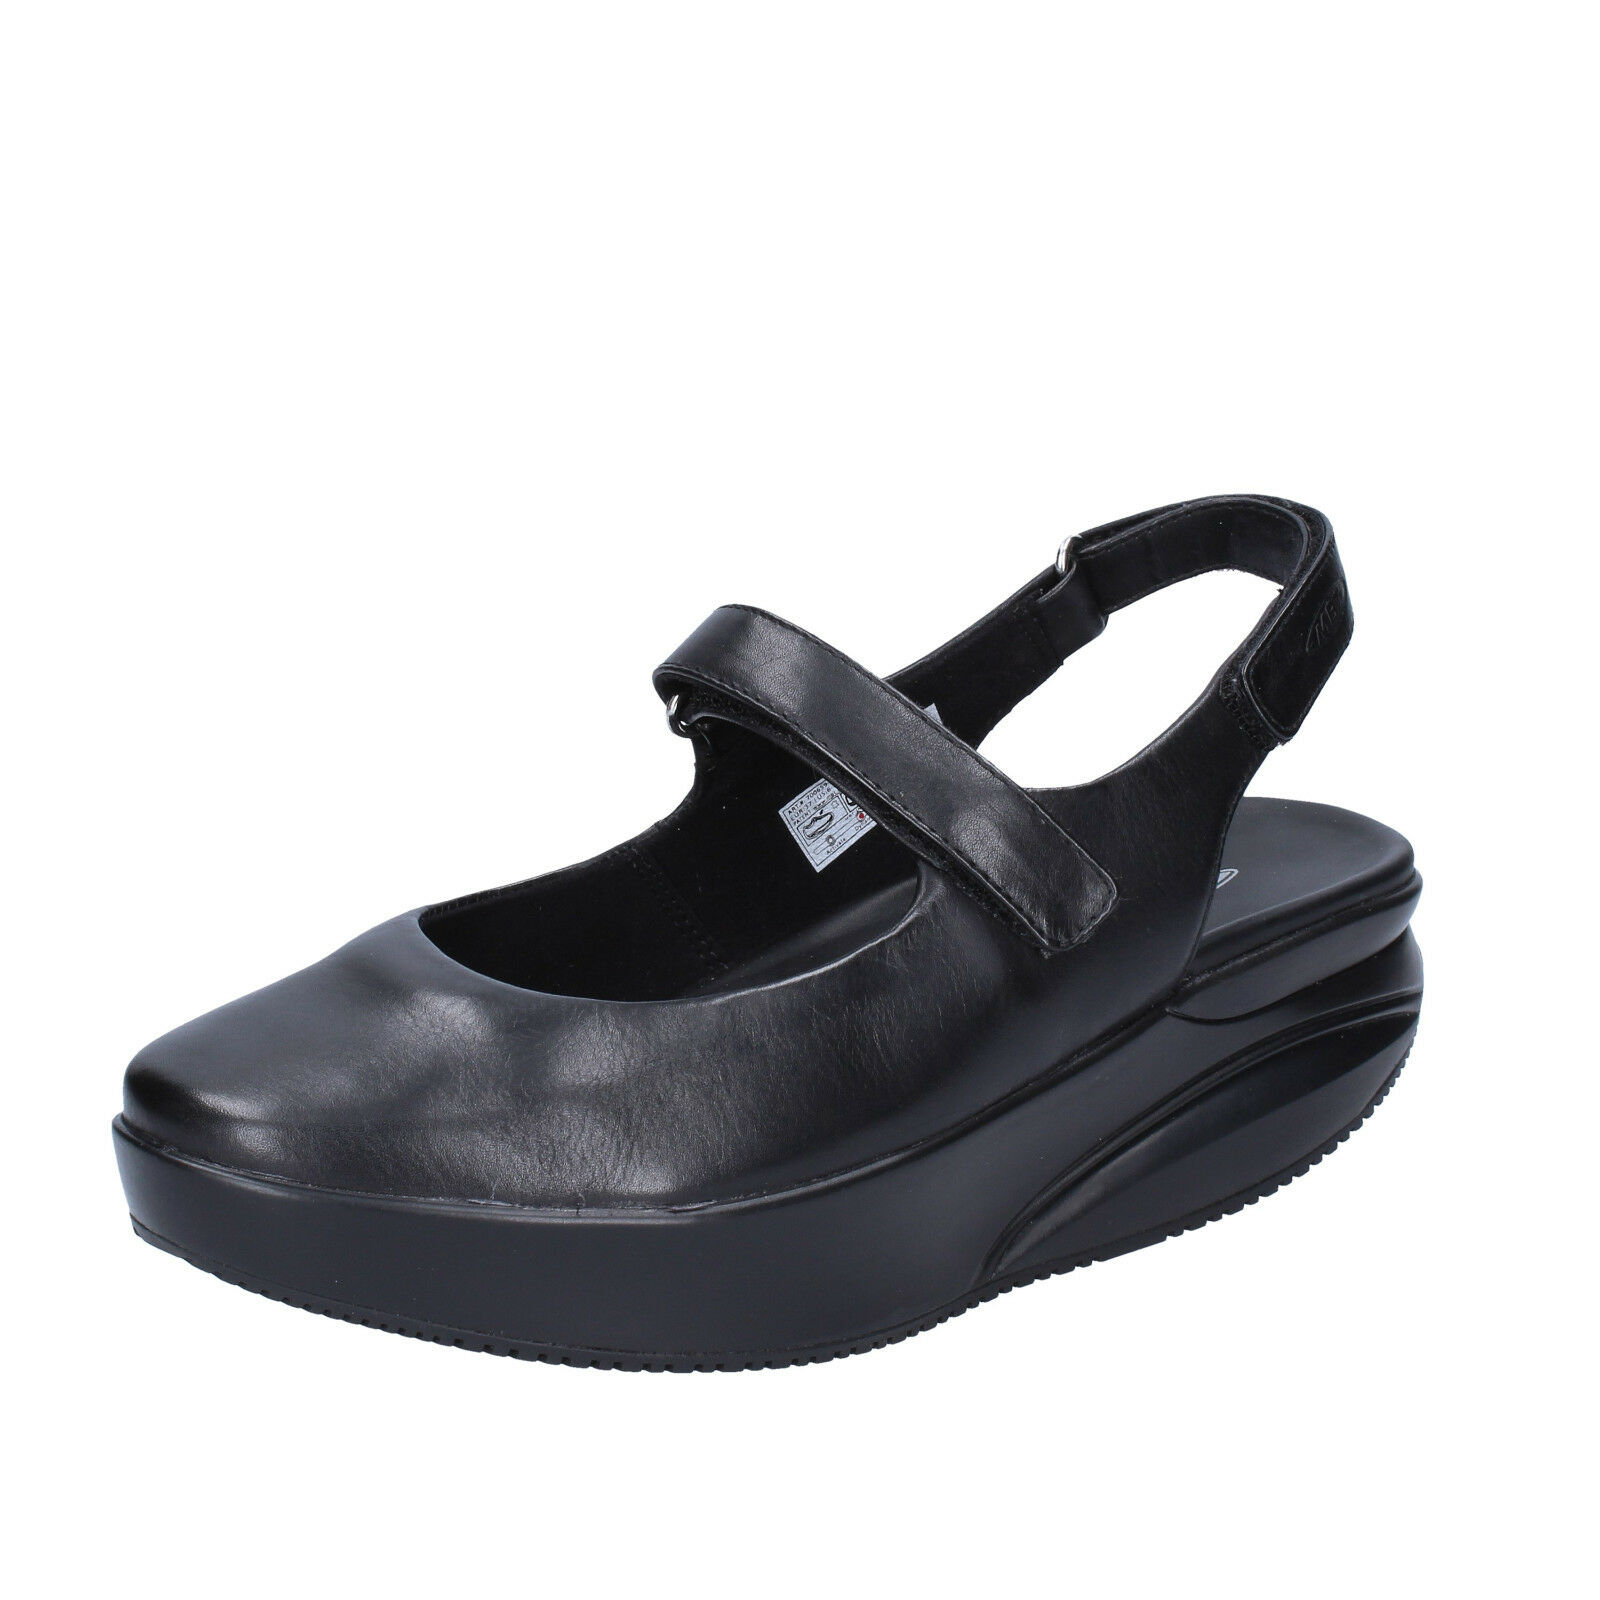 Womens shoes MBT Koffi 39 EU Ballerinas Black Leather Dynamic bx889-39